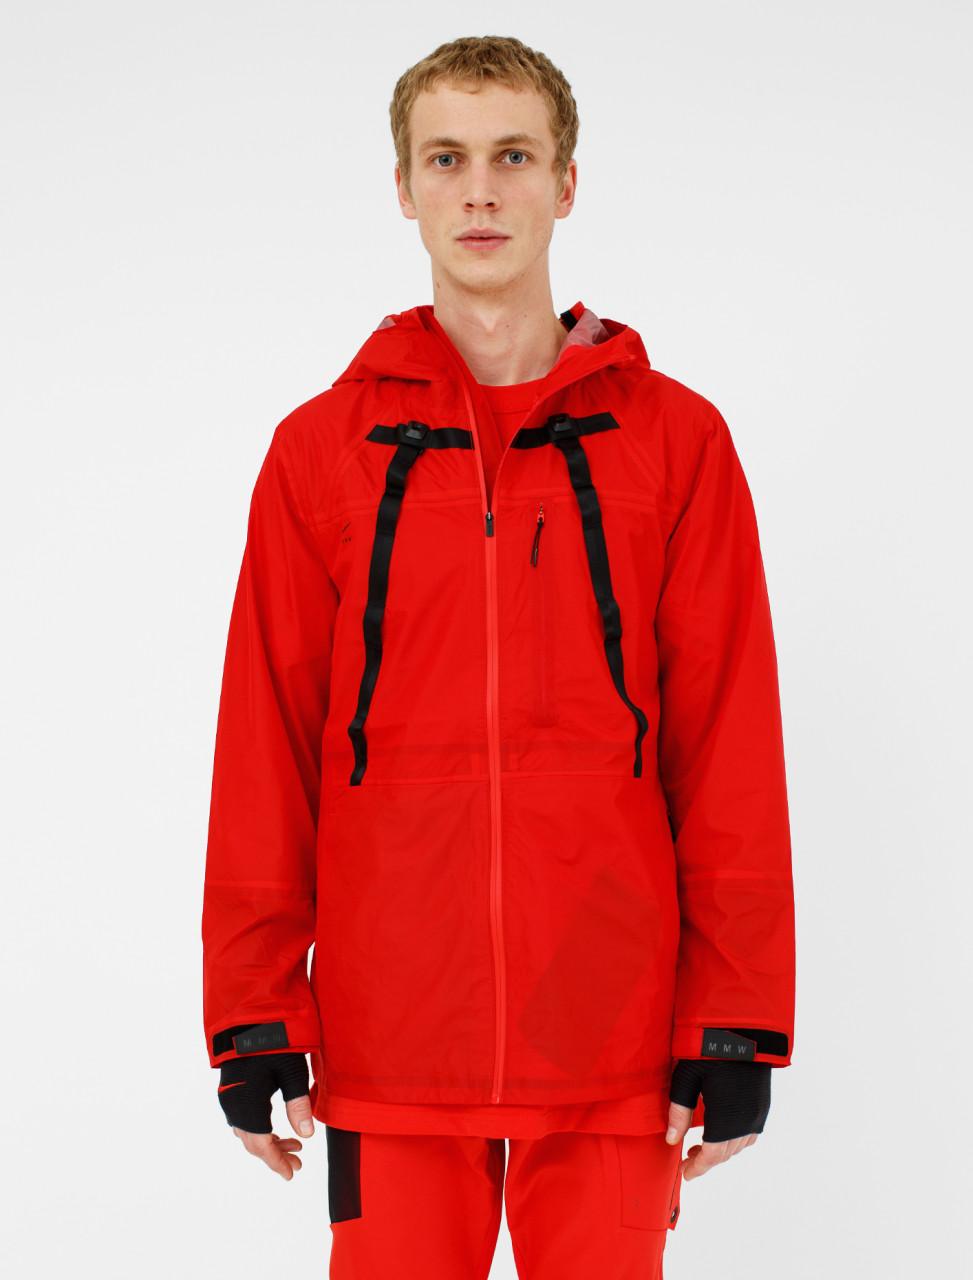 x MMW Jacket in University Red